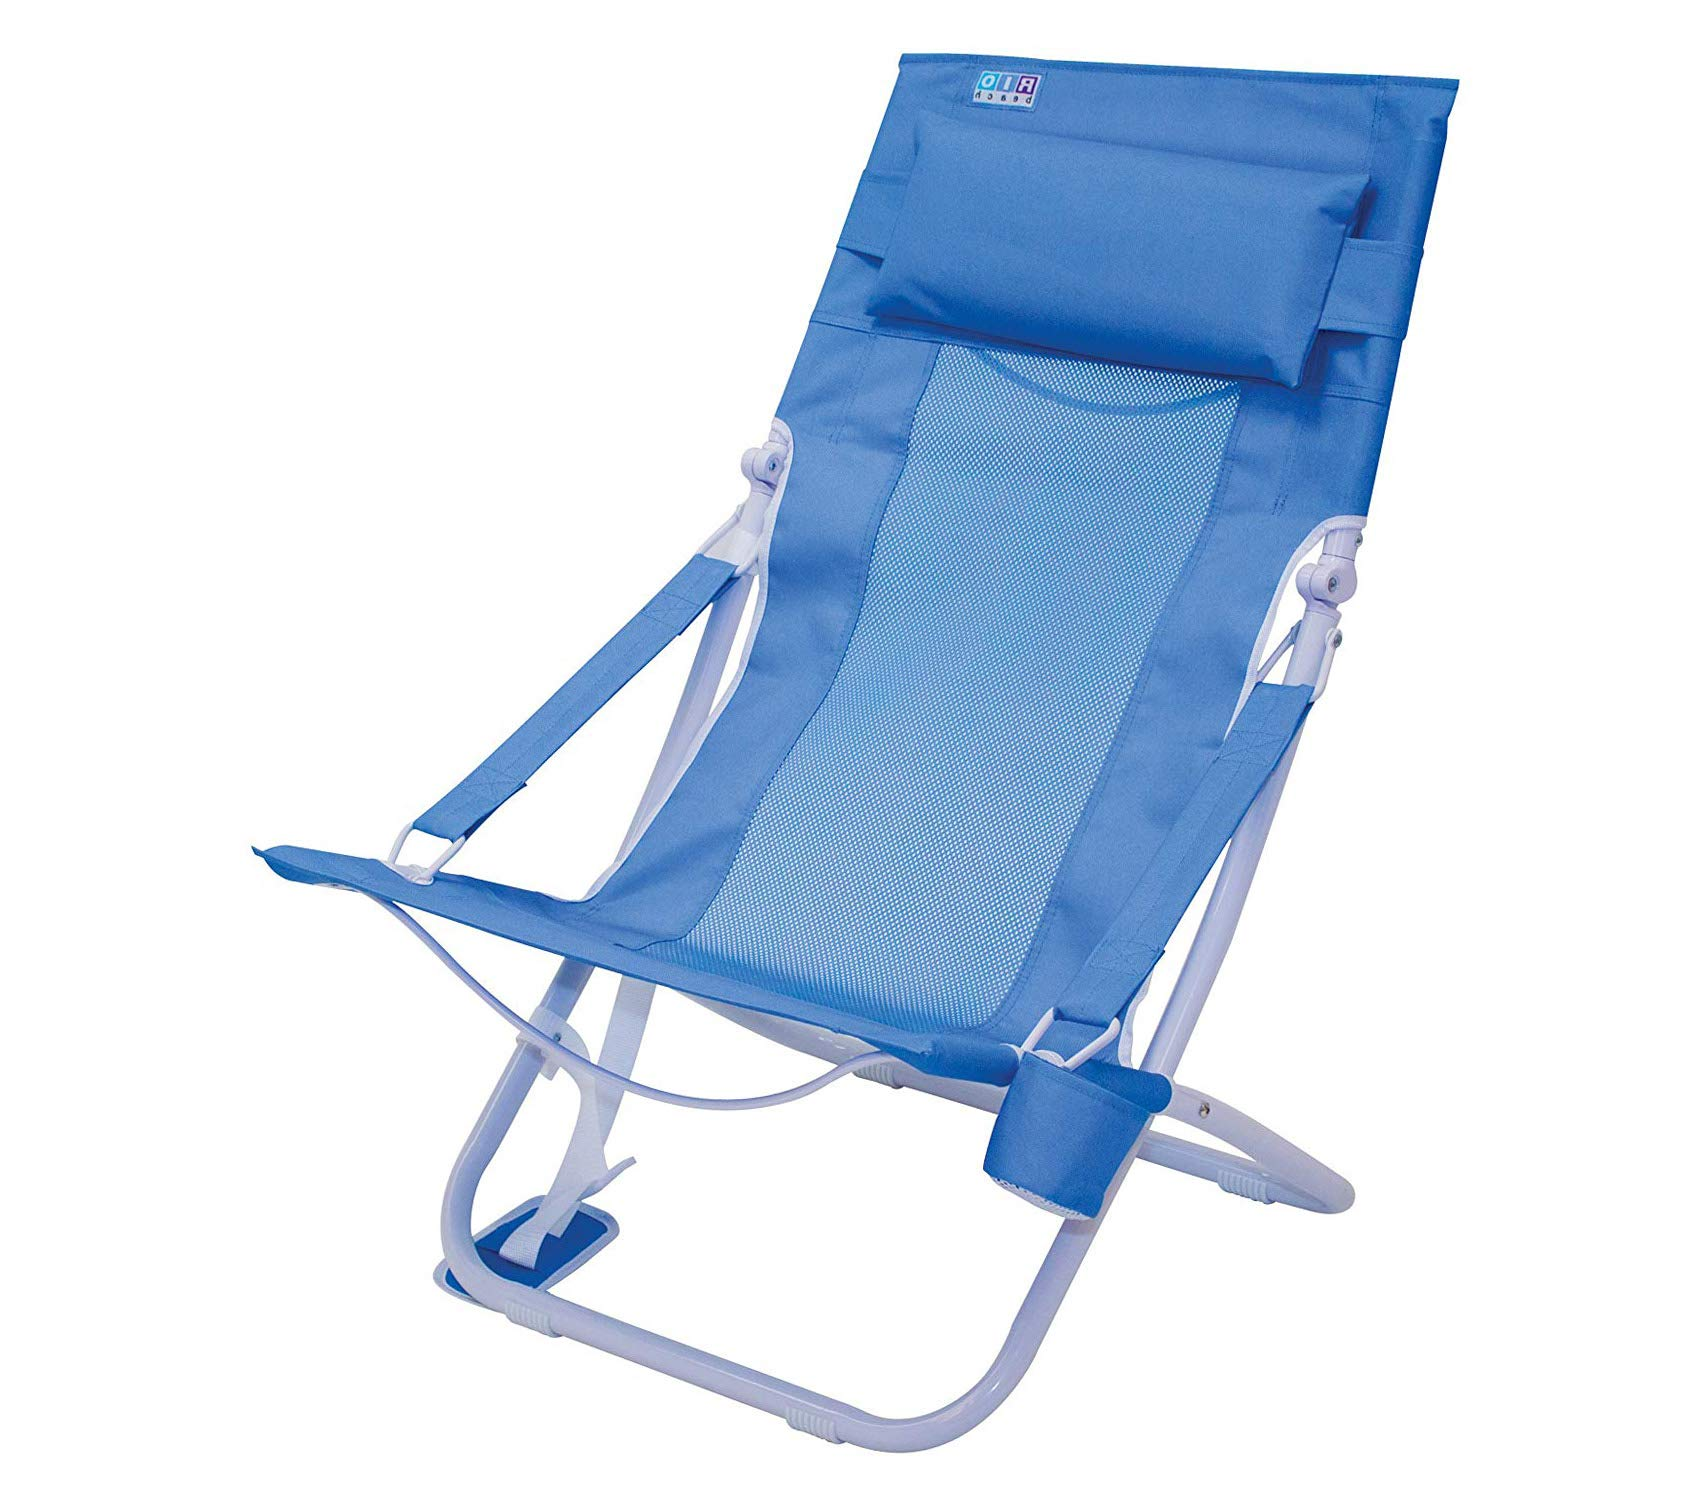 Wood & Style Patio Outdoor Garden Premium Rio Beach Portable Compact Fold Breeze Beach Sling Chair